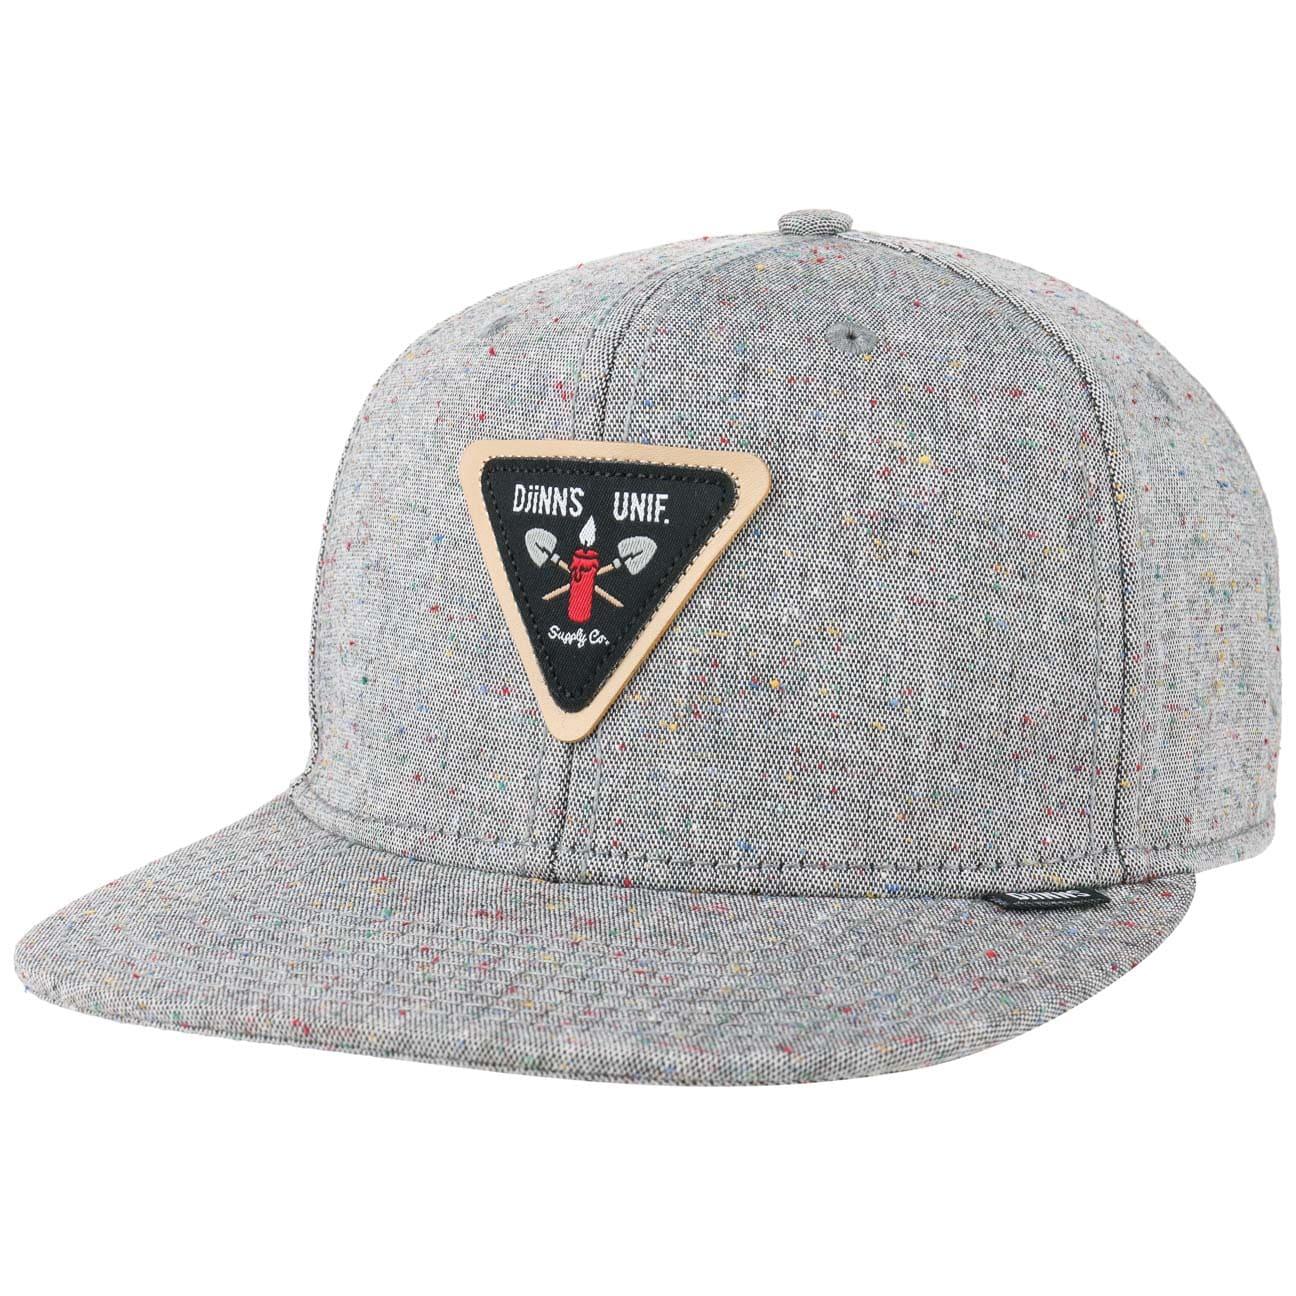 6 Panel Spotted Snapback Cap by Djinns  snapback cap